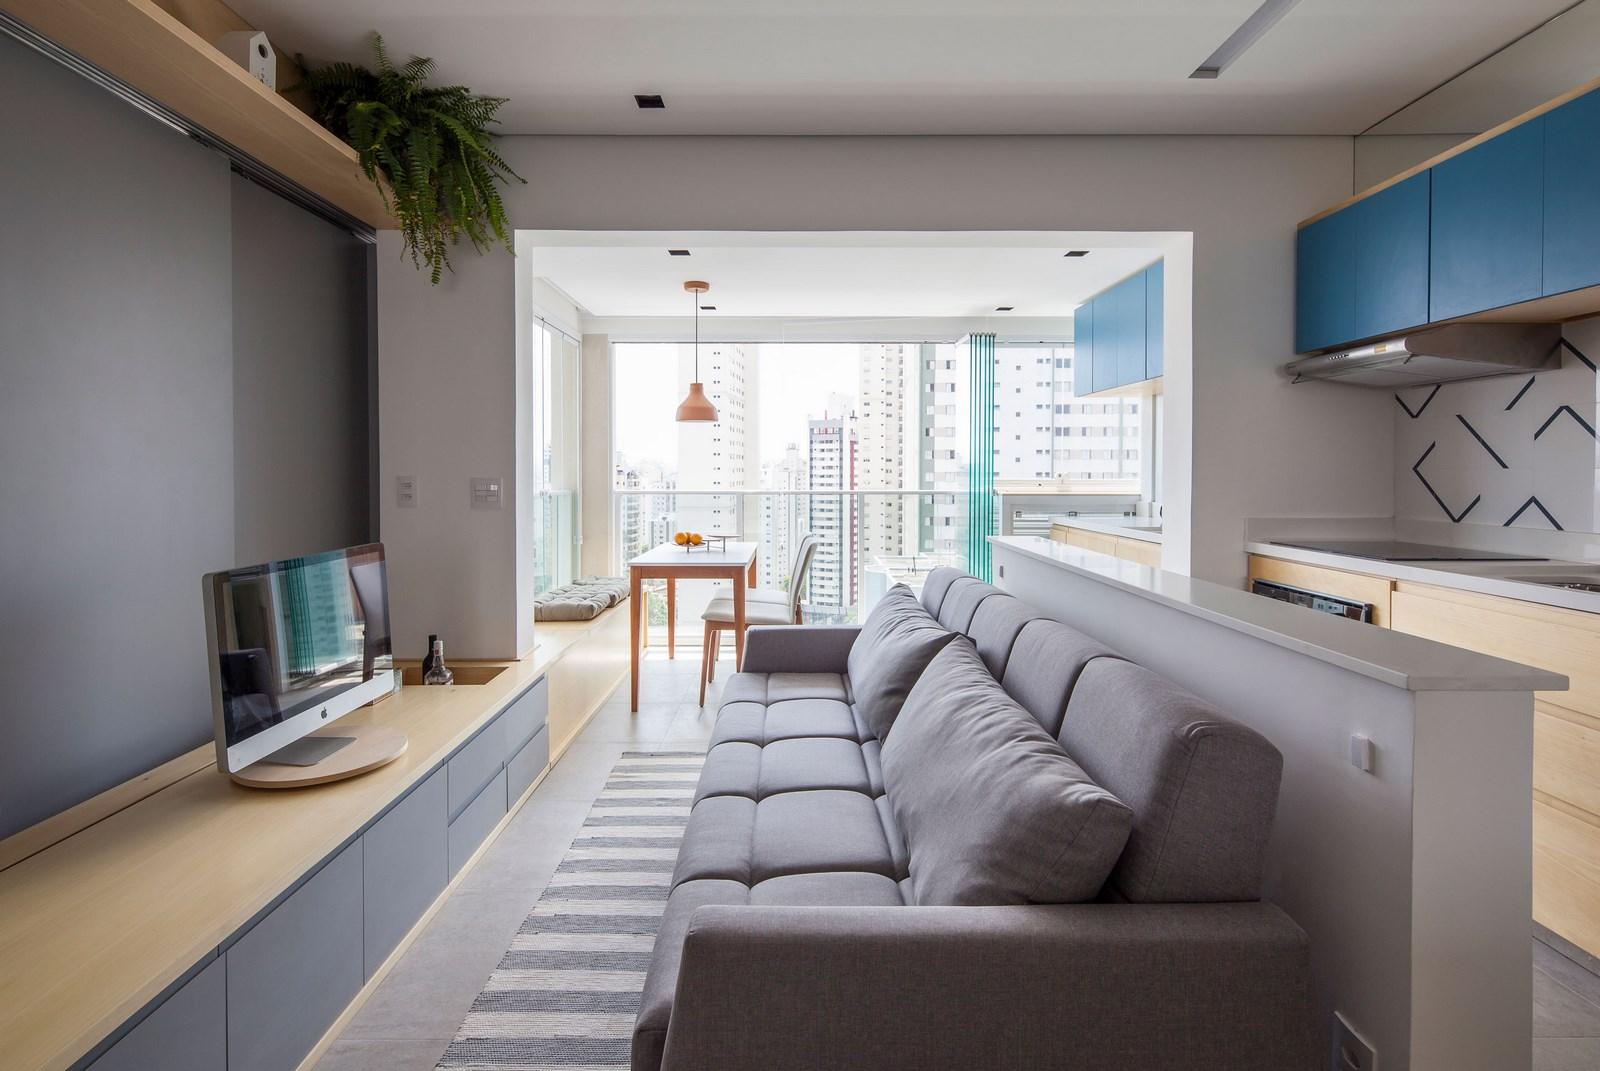 Apartamento Cazo _ Estúdio BRA (6) (Copy)